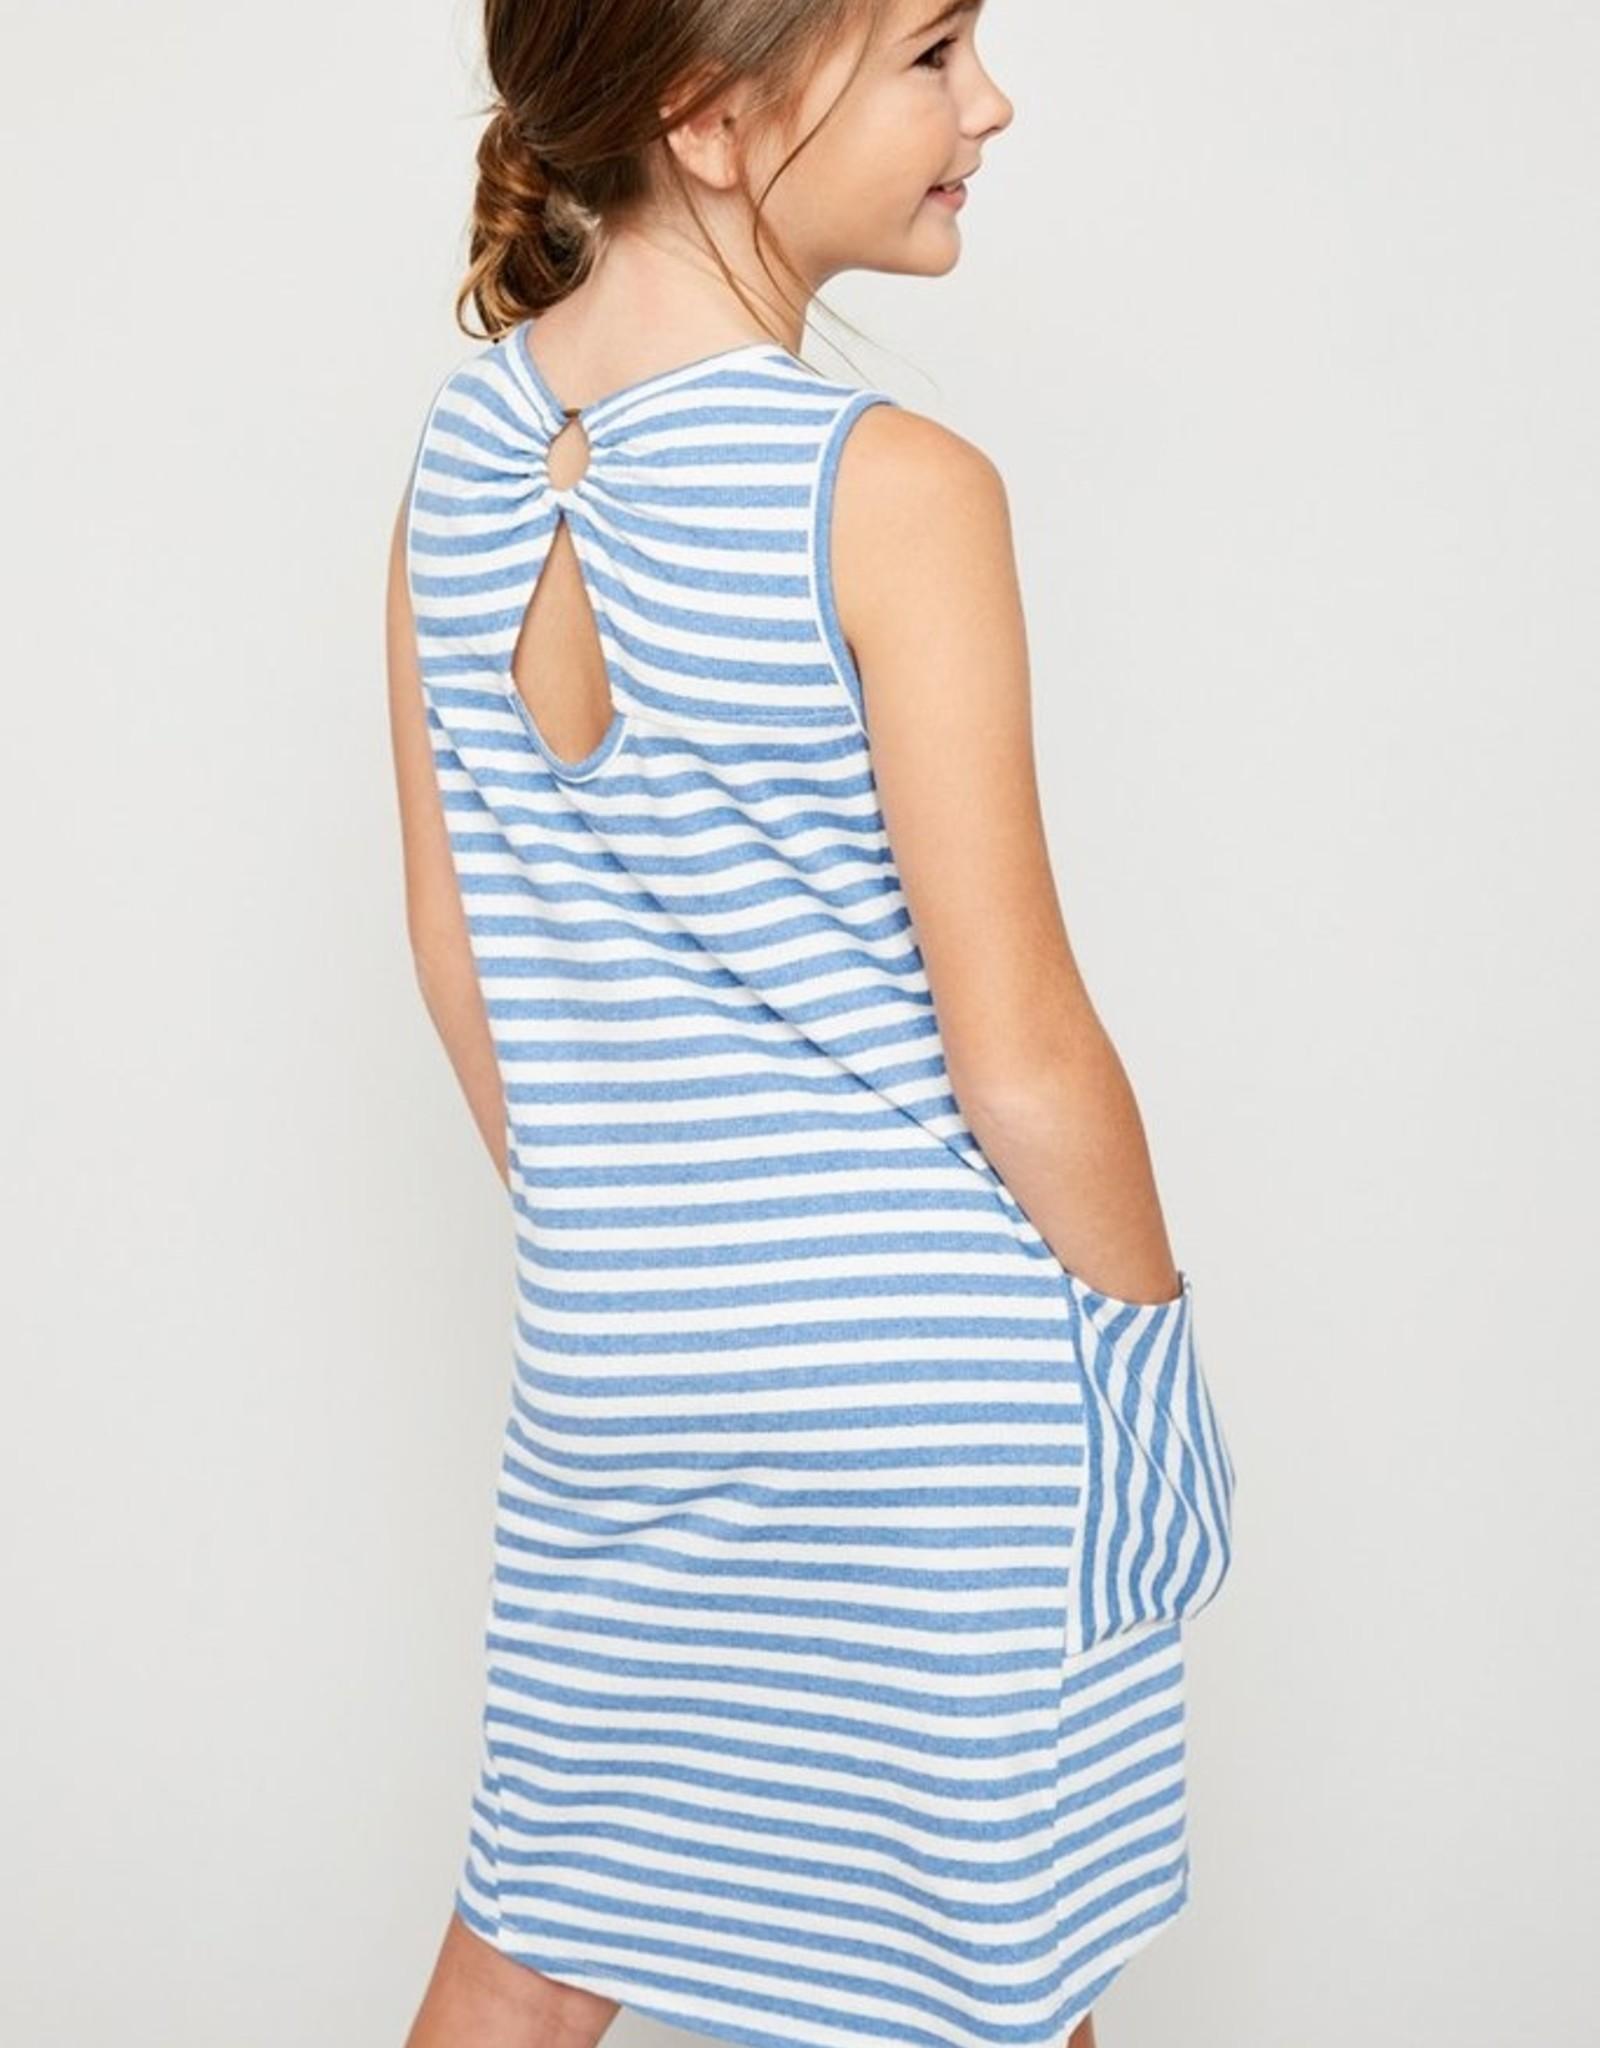 Hayden Los Angeles Blue/White Stripe Dress